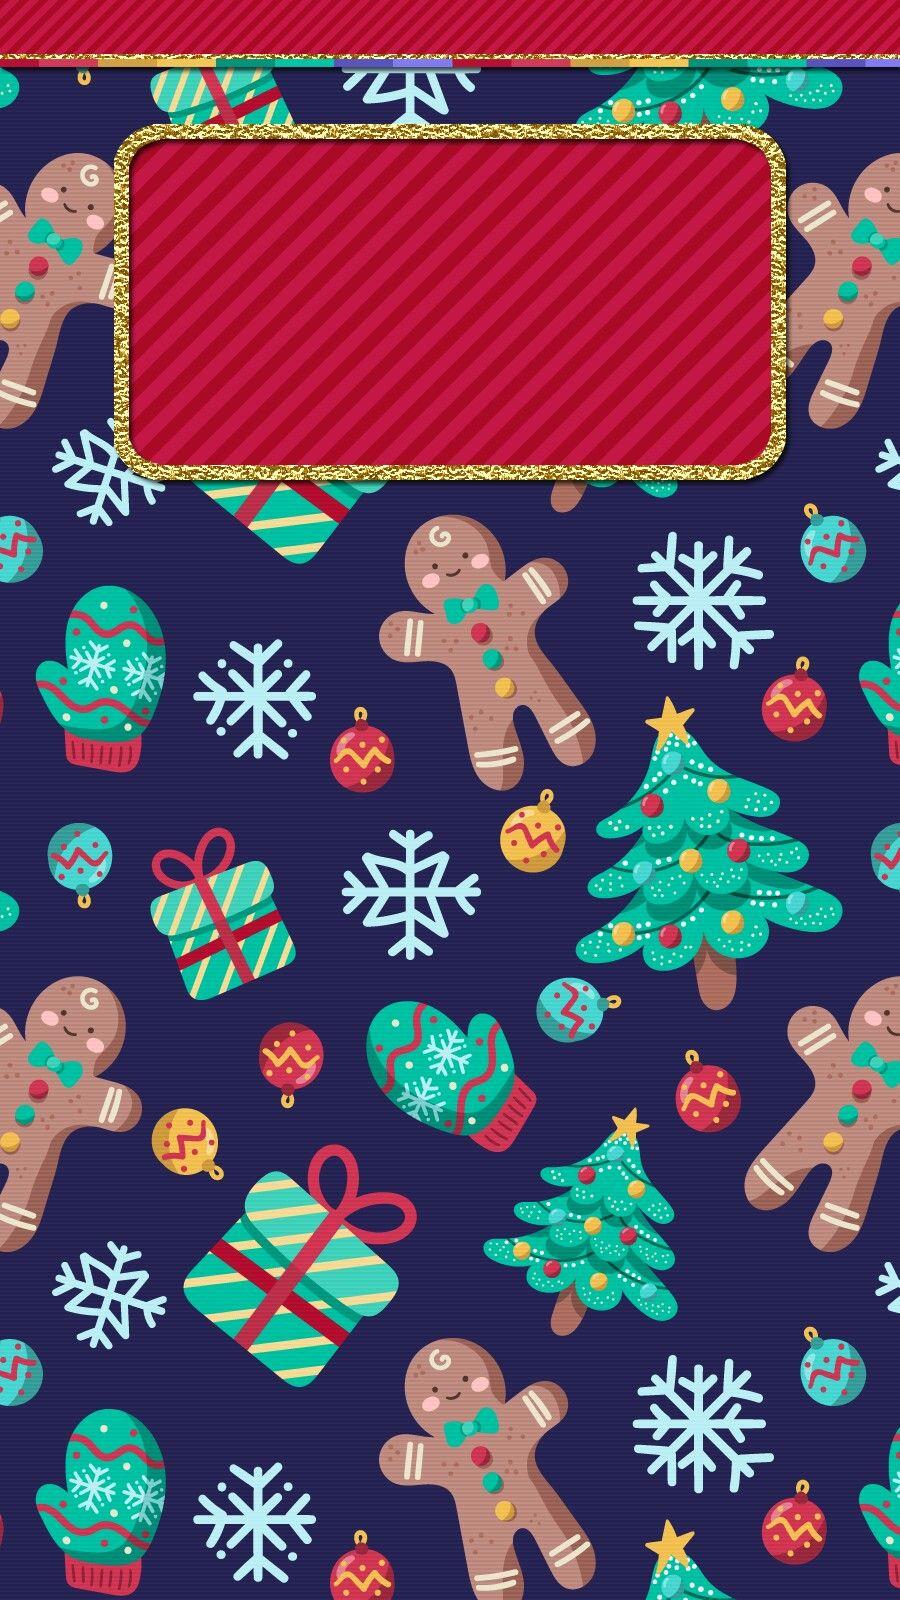 Christmas Lockscreen Digitalcutewalls Wallpaper Iphone Christmas Cute Christmas Wallpaper Christmas Wallpaper